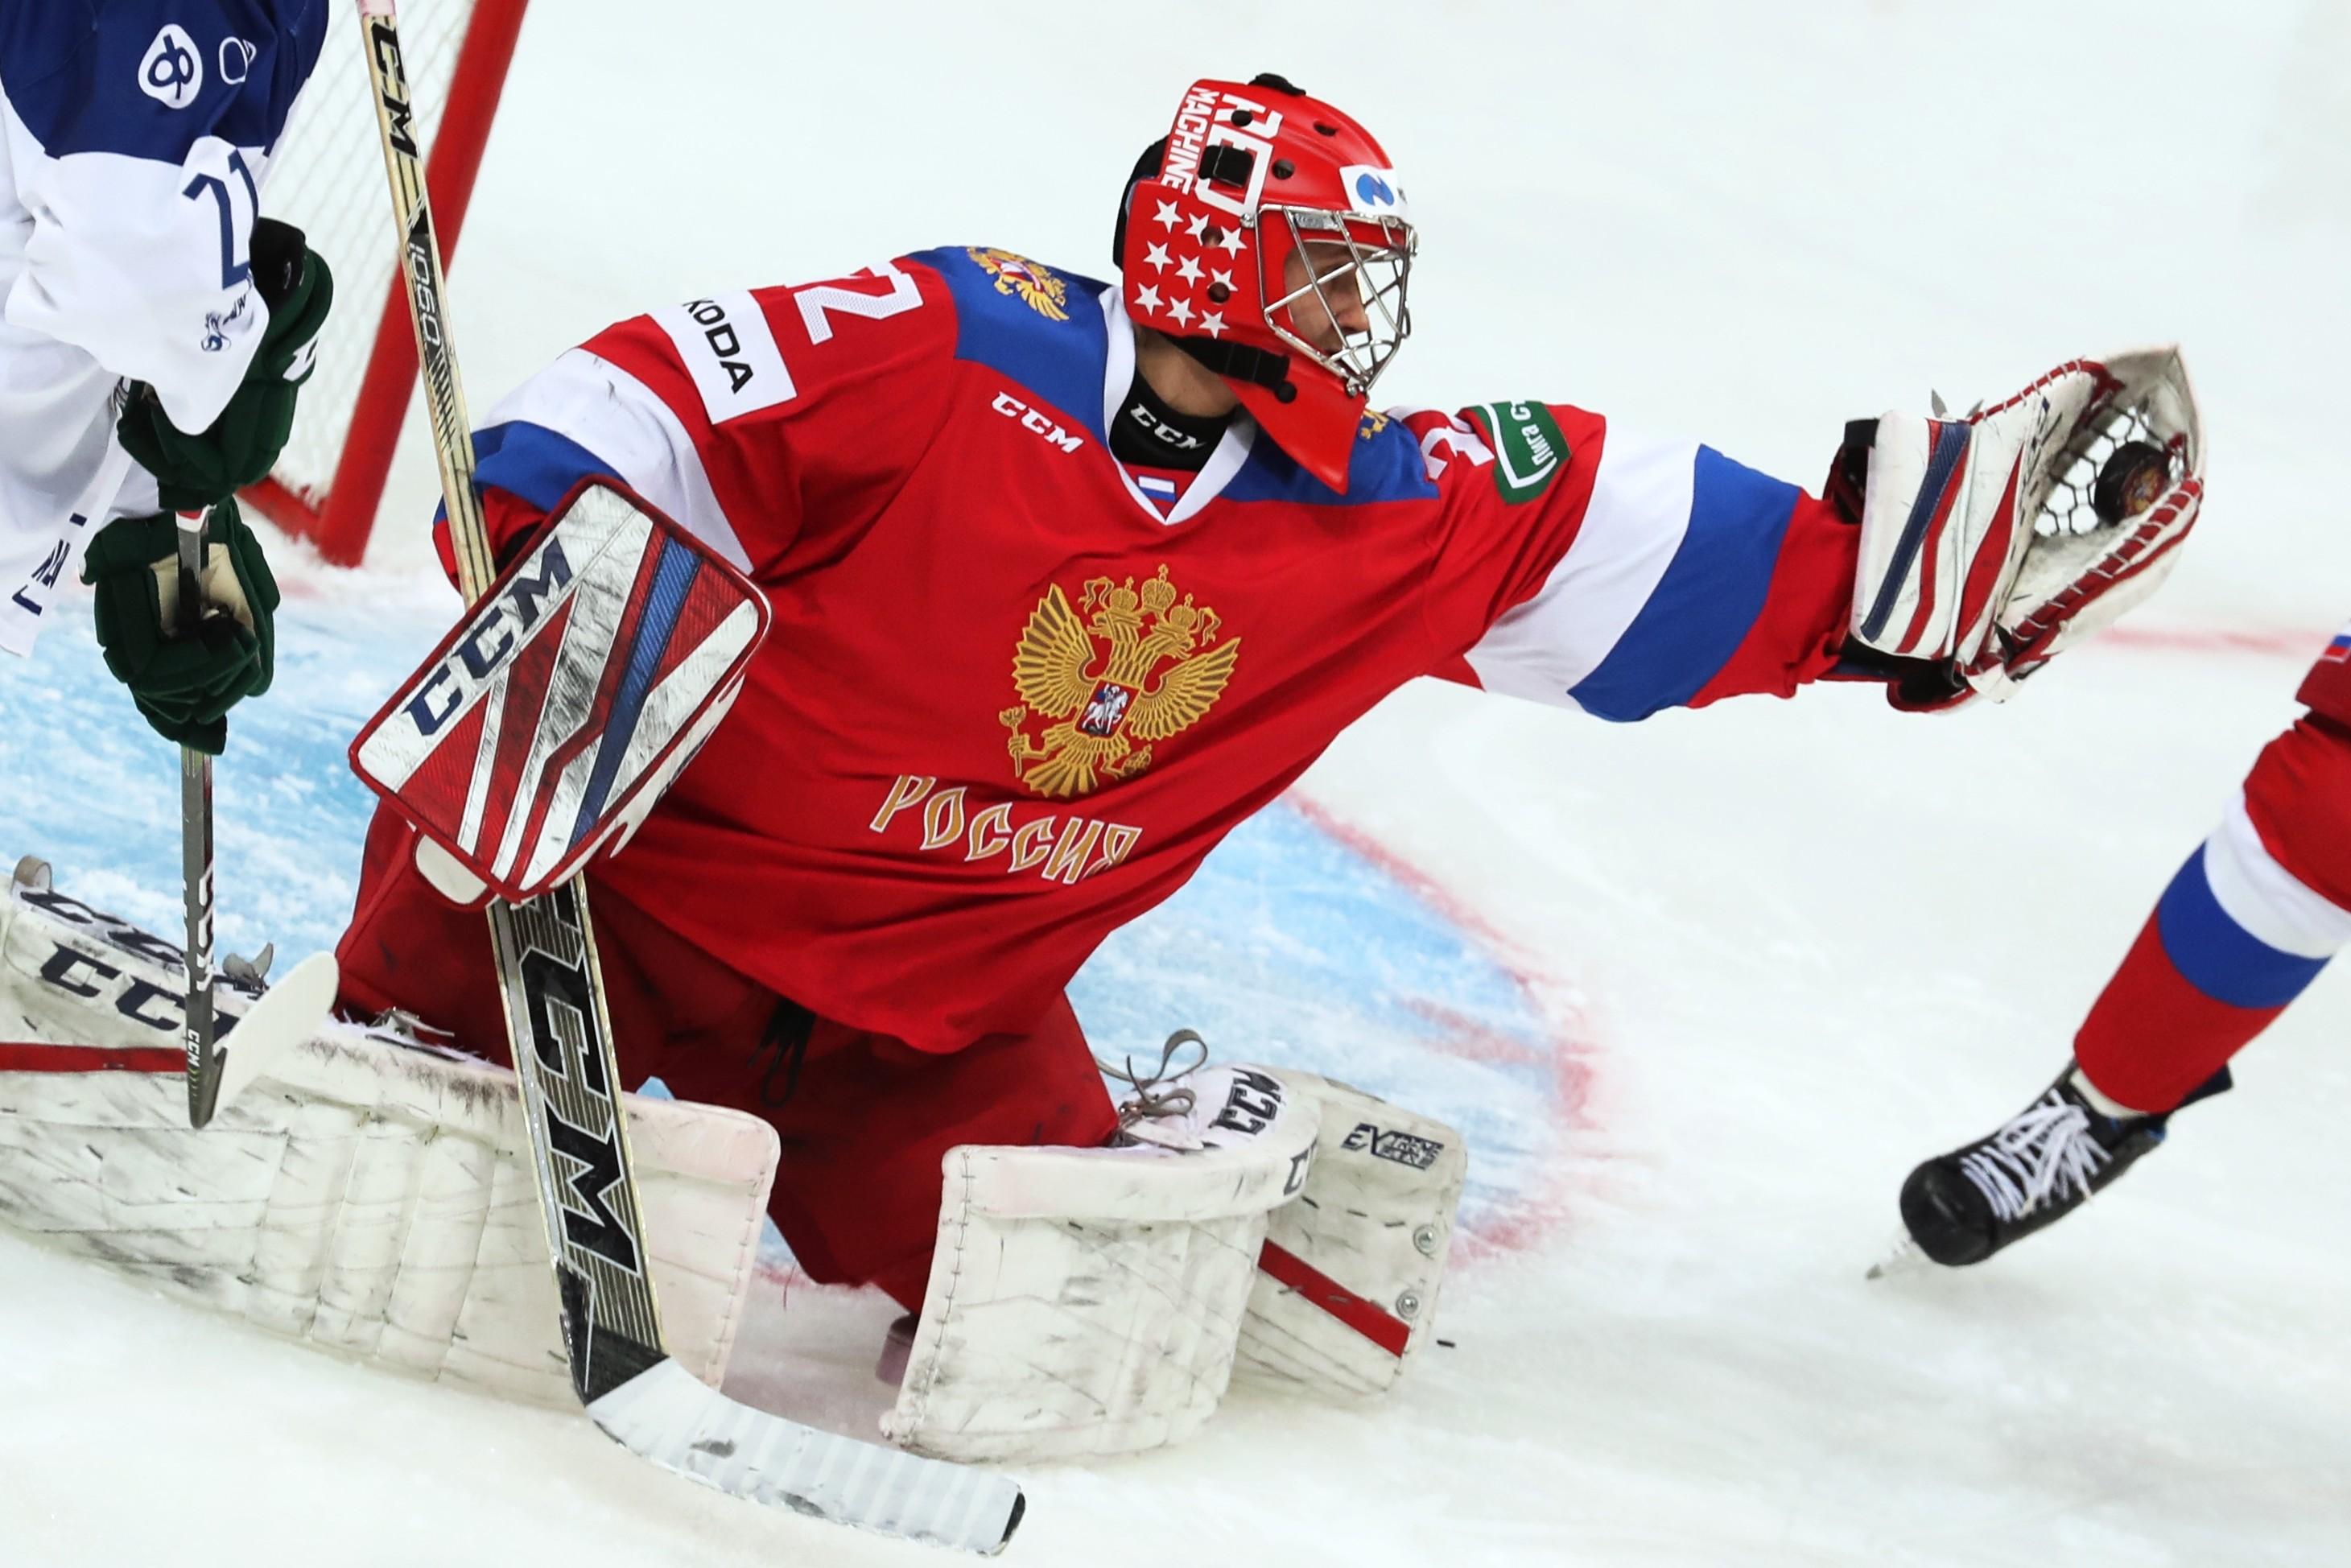 Фото: РИА Новости / Ярослав Неелов